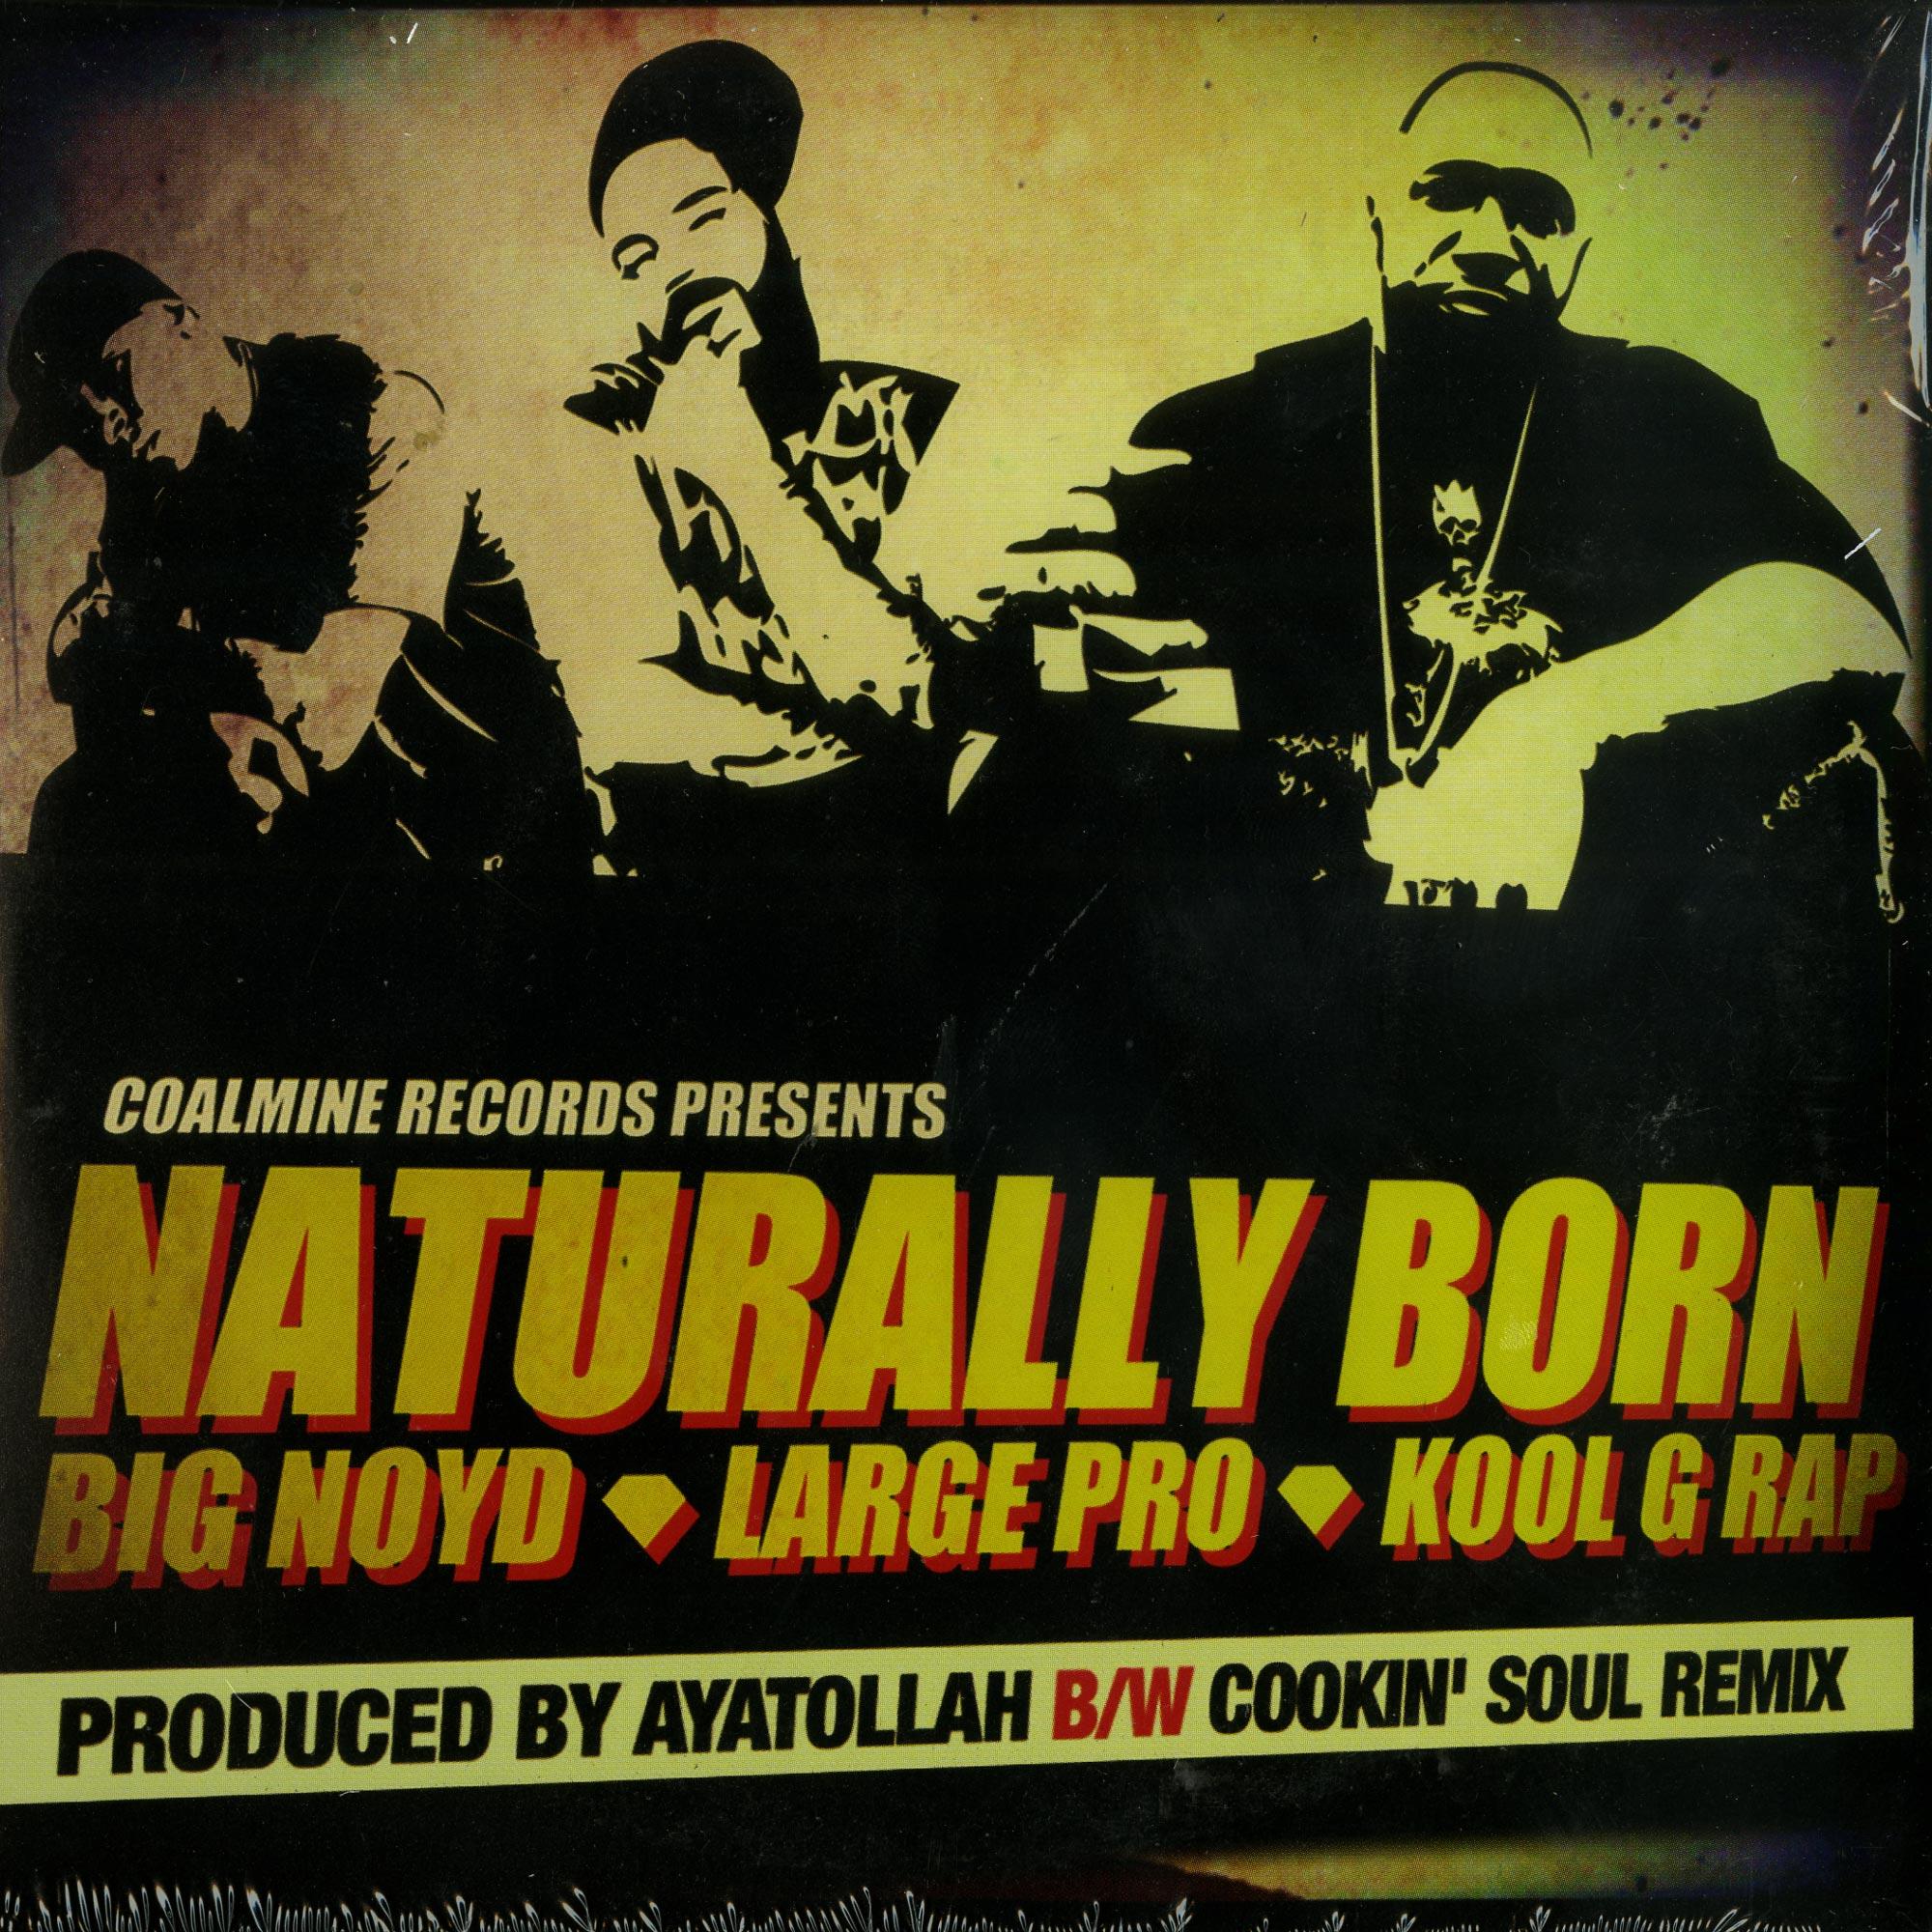 Big Noyd. Large Pro. Kool G Rap - NATURALLY BORN